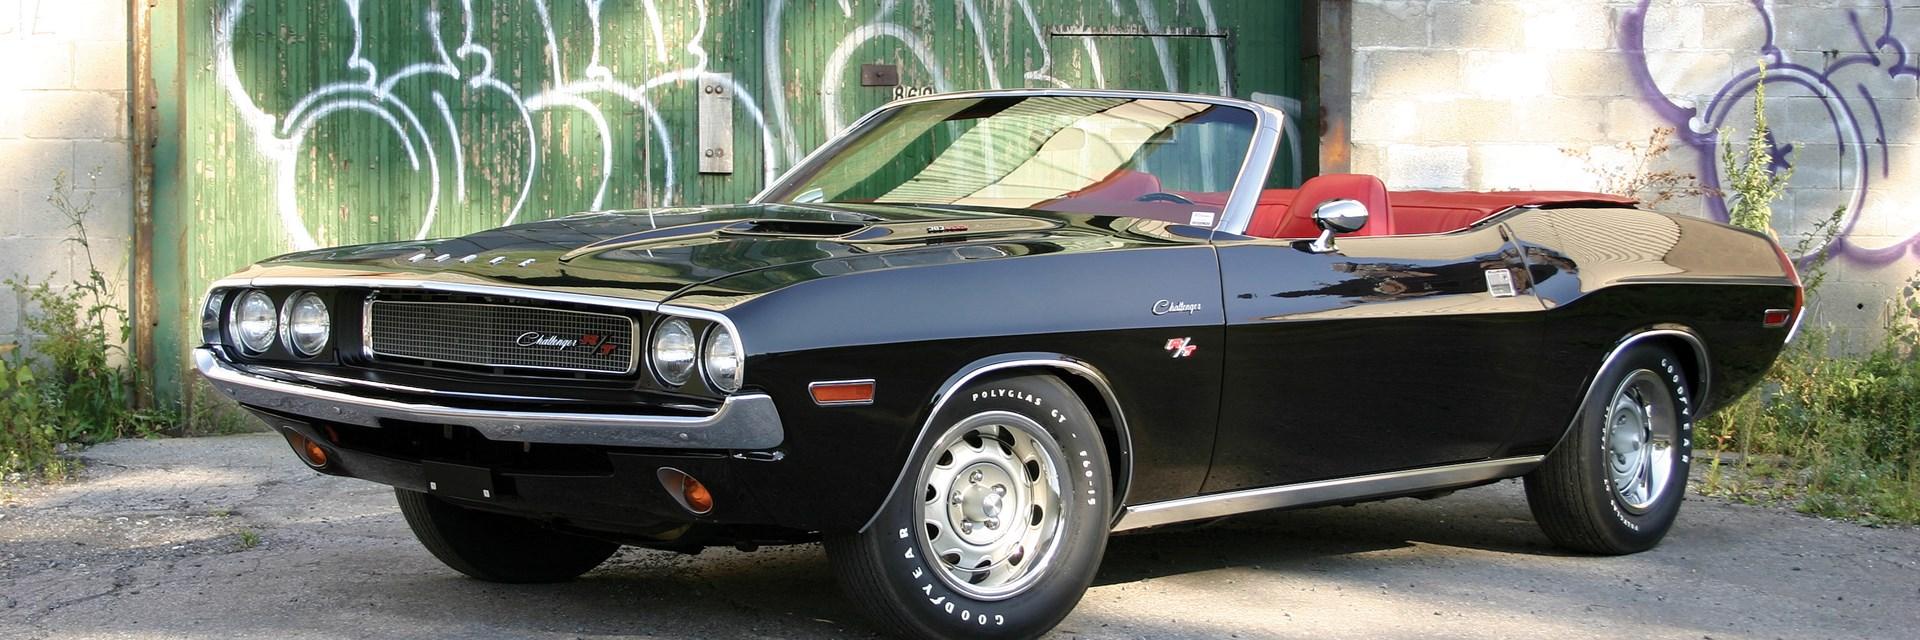 Toronto International Spring Classic Car Auction